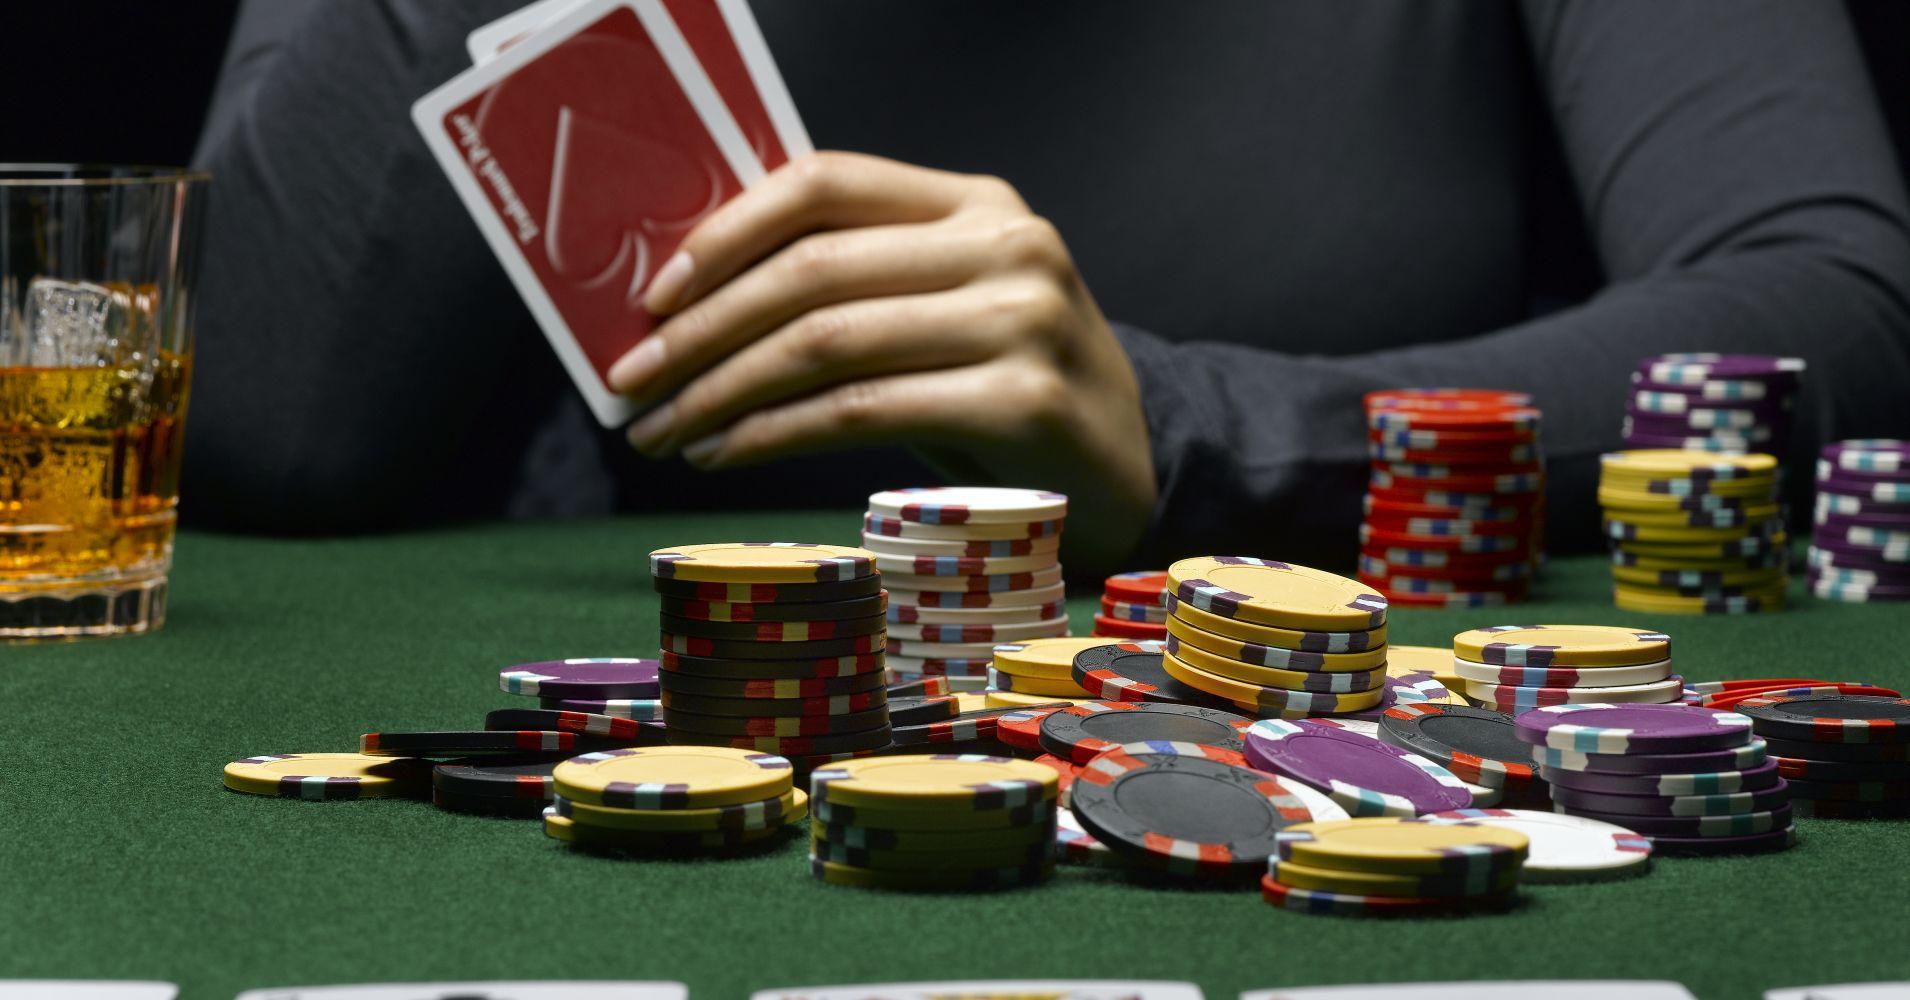 card convoy gambling online games